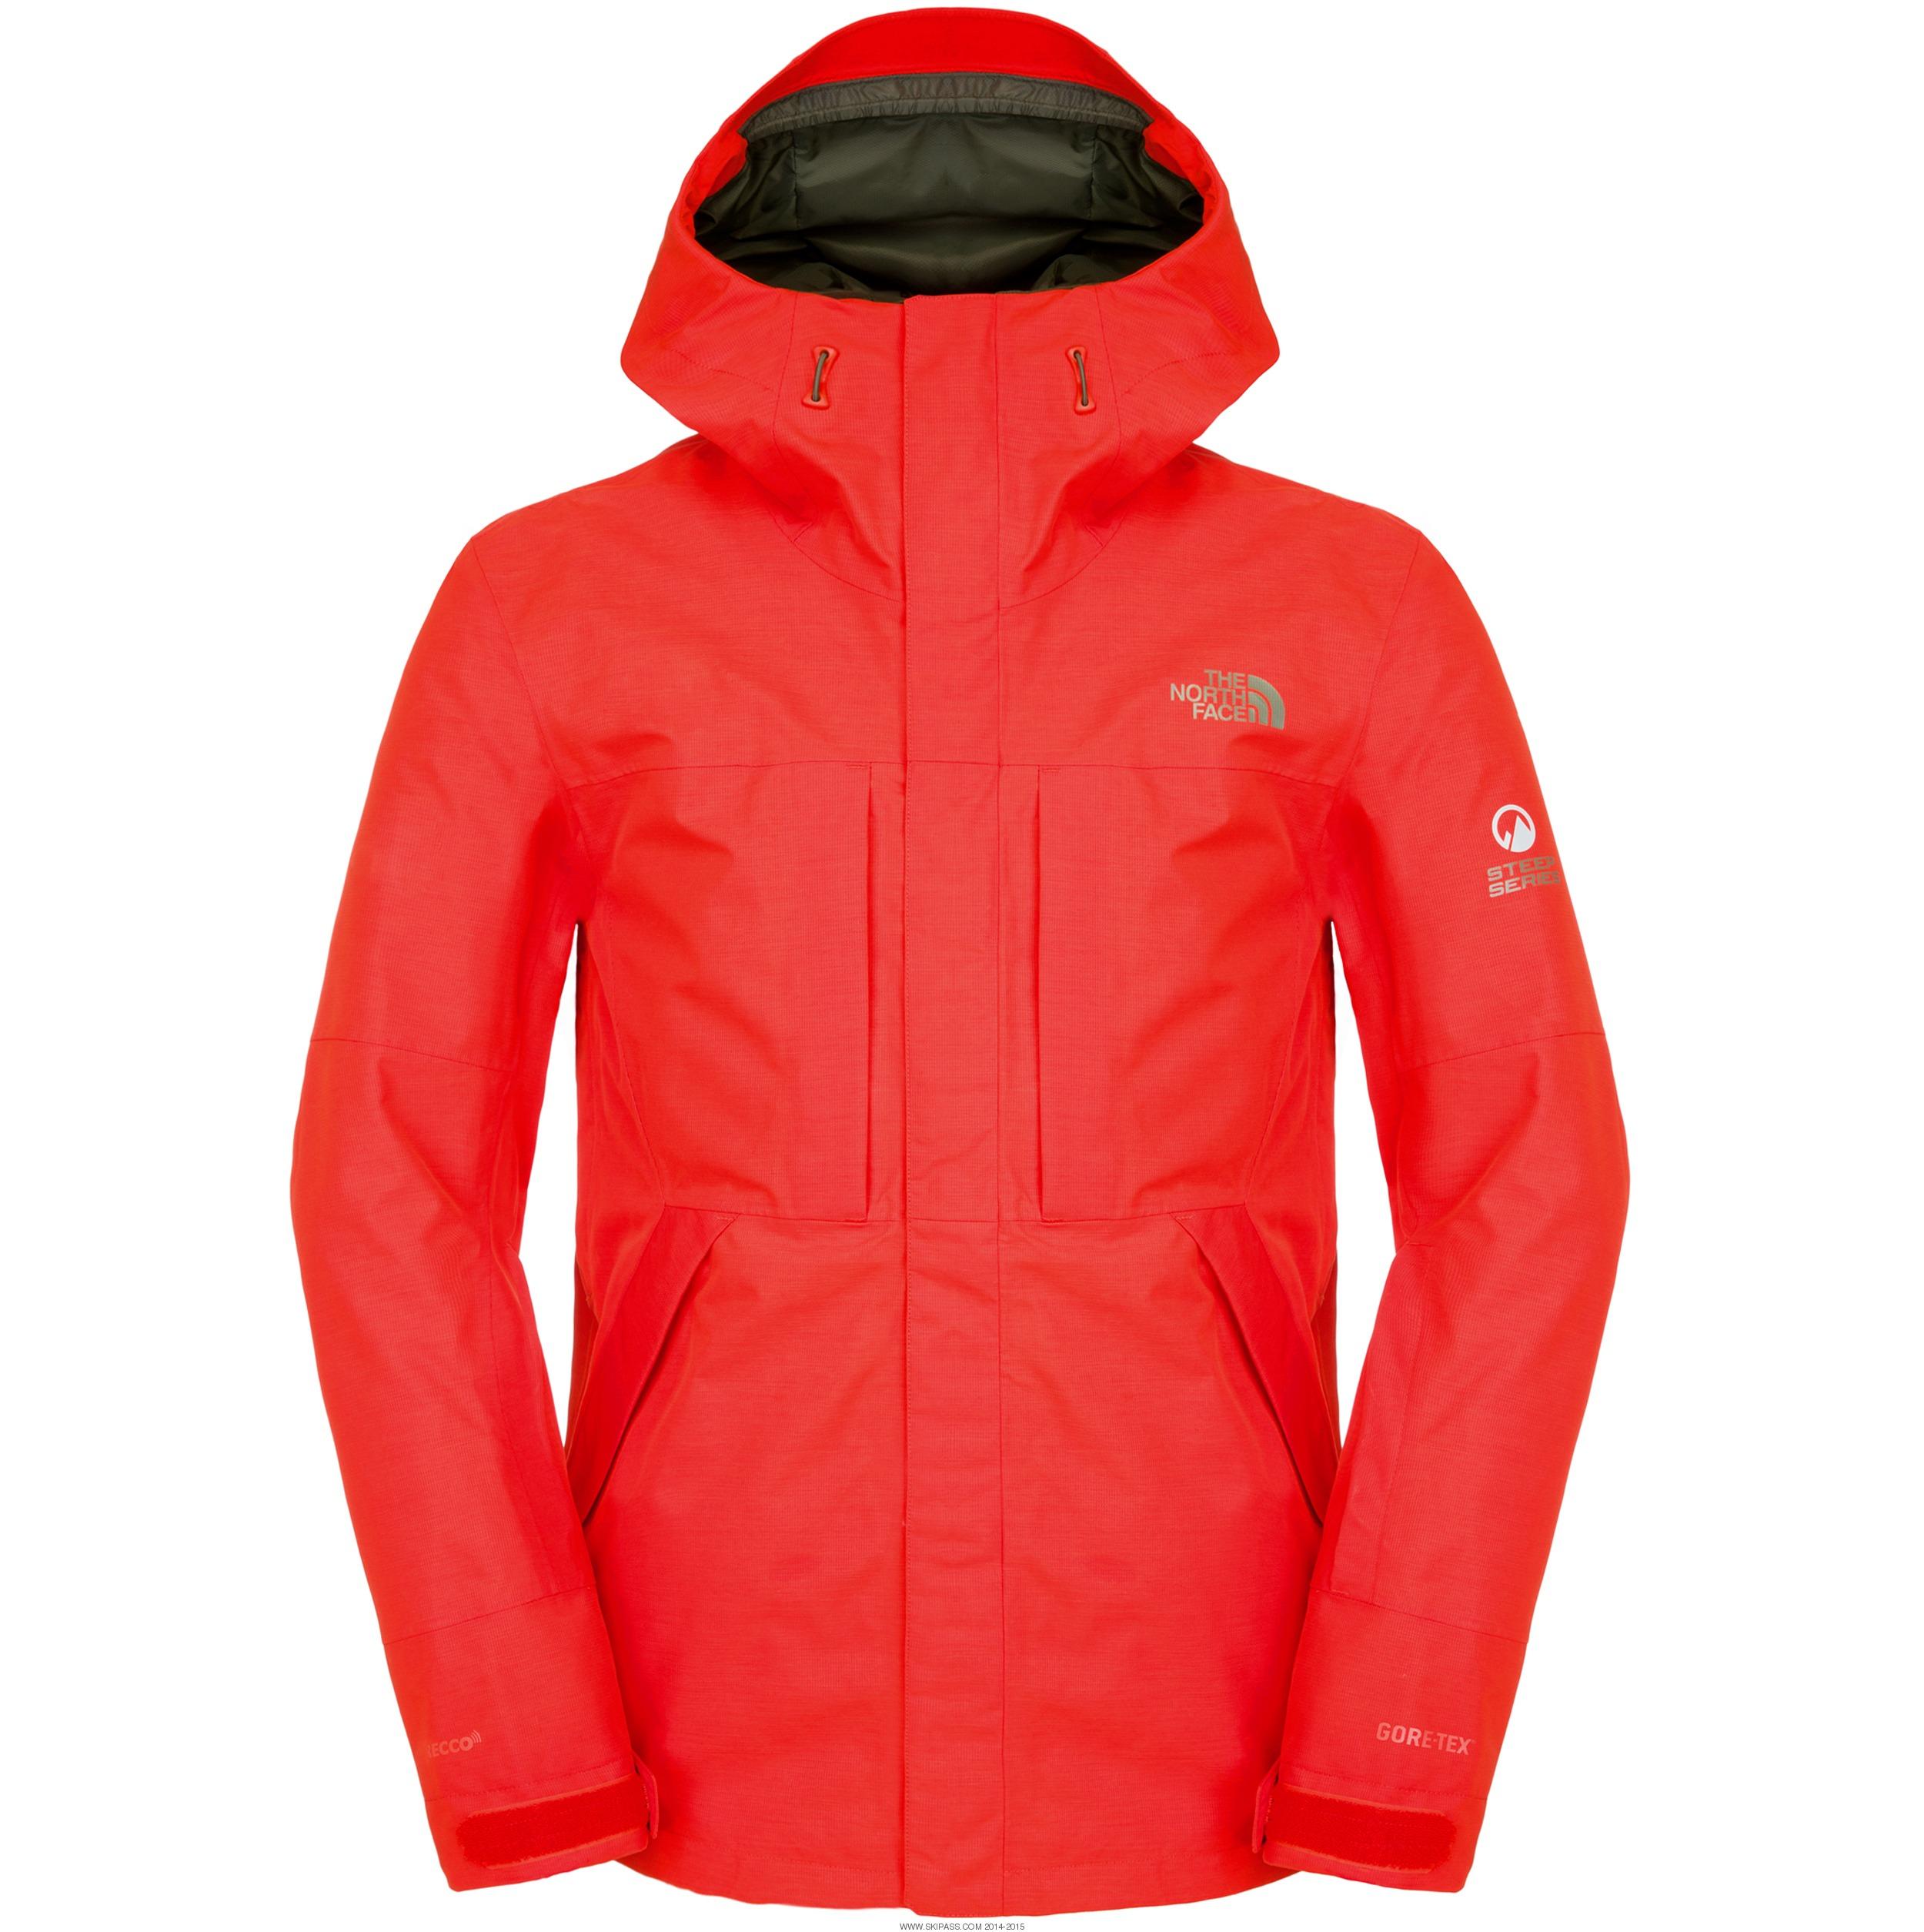 THE NORTH FACE Veste Ski Homme NFZ Jacket M Jaune